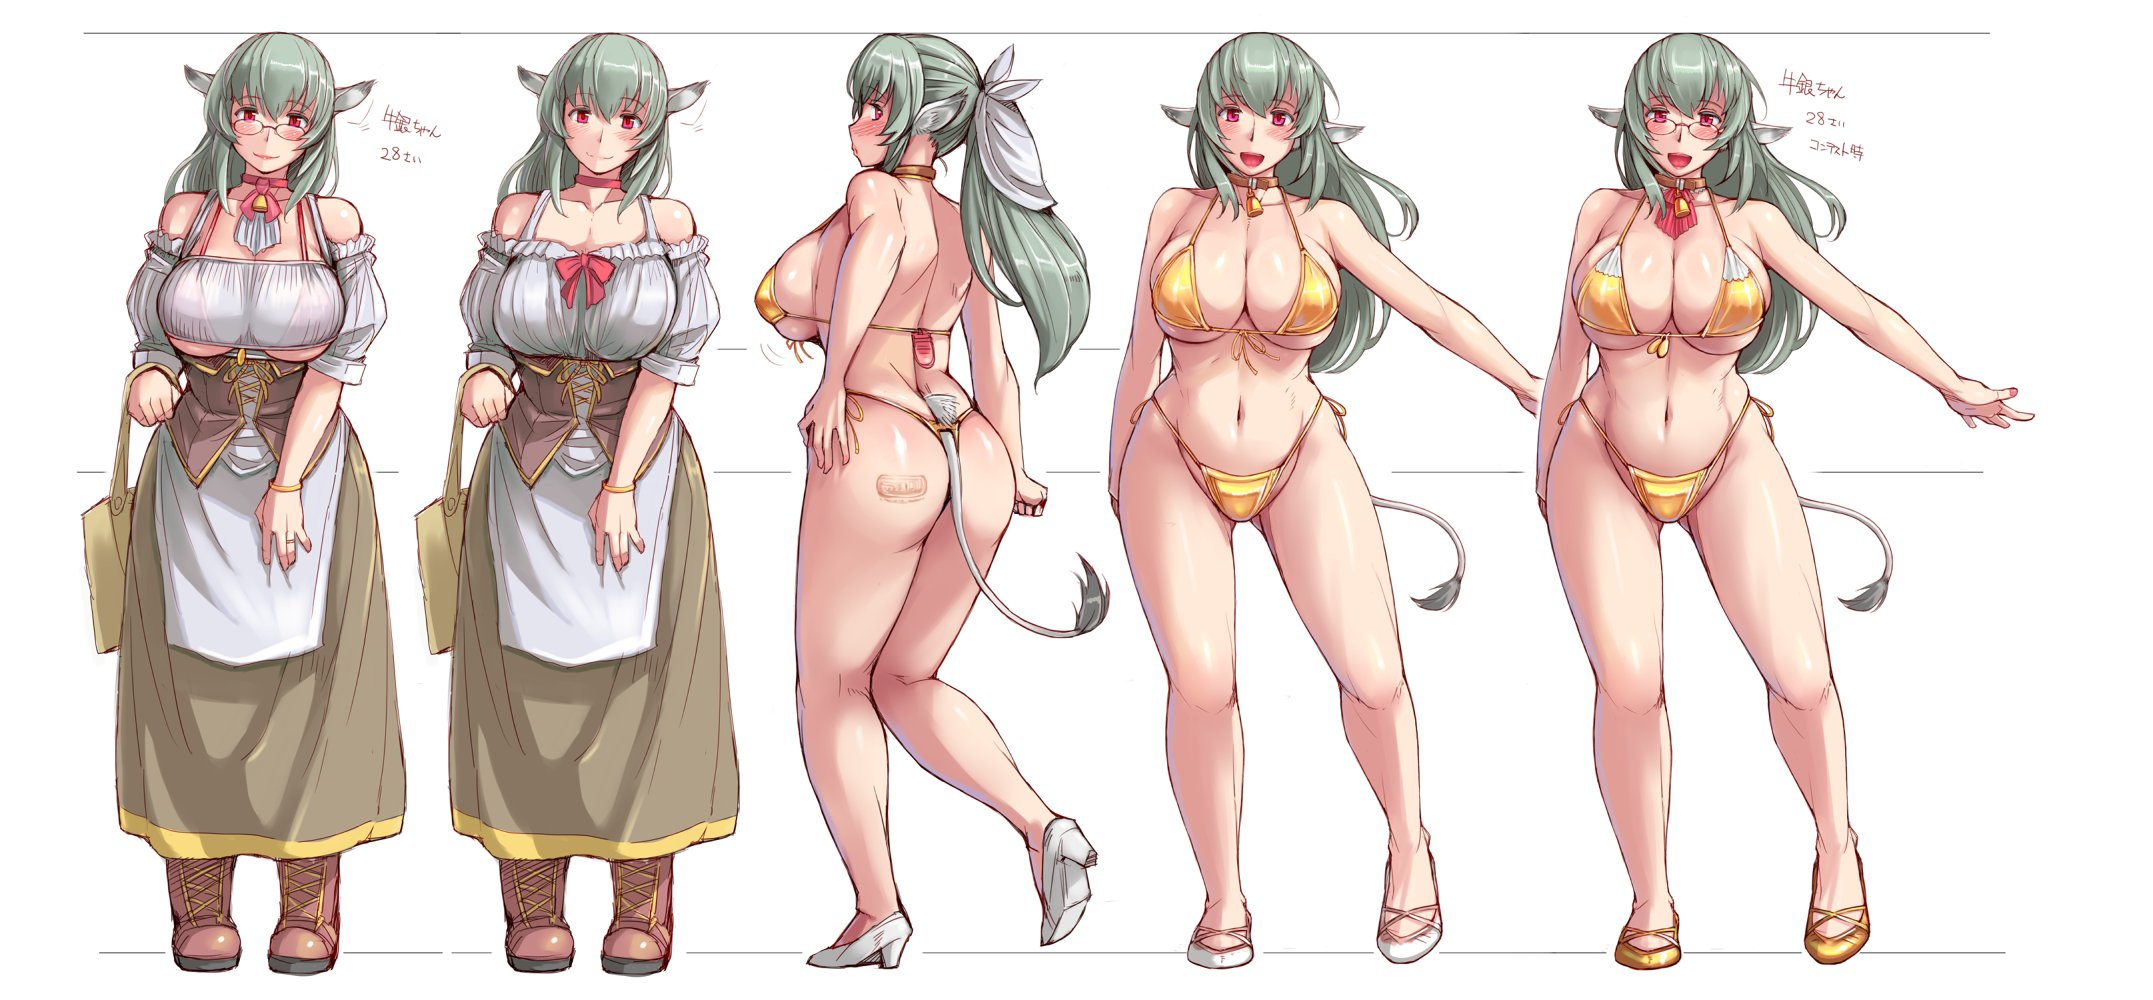 Characters: Beast-Kin (animal-trait people) Fb87cadf3b69c38b38610a6e89fa2a09_by_tamamonomae1112-db7ku0p